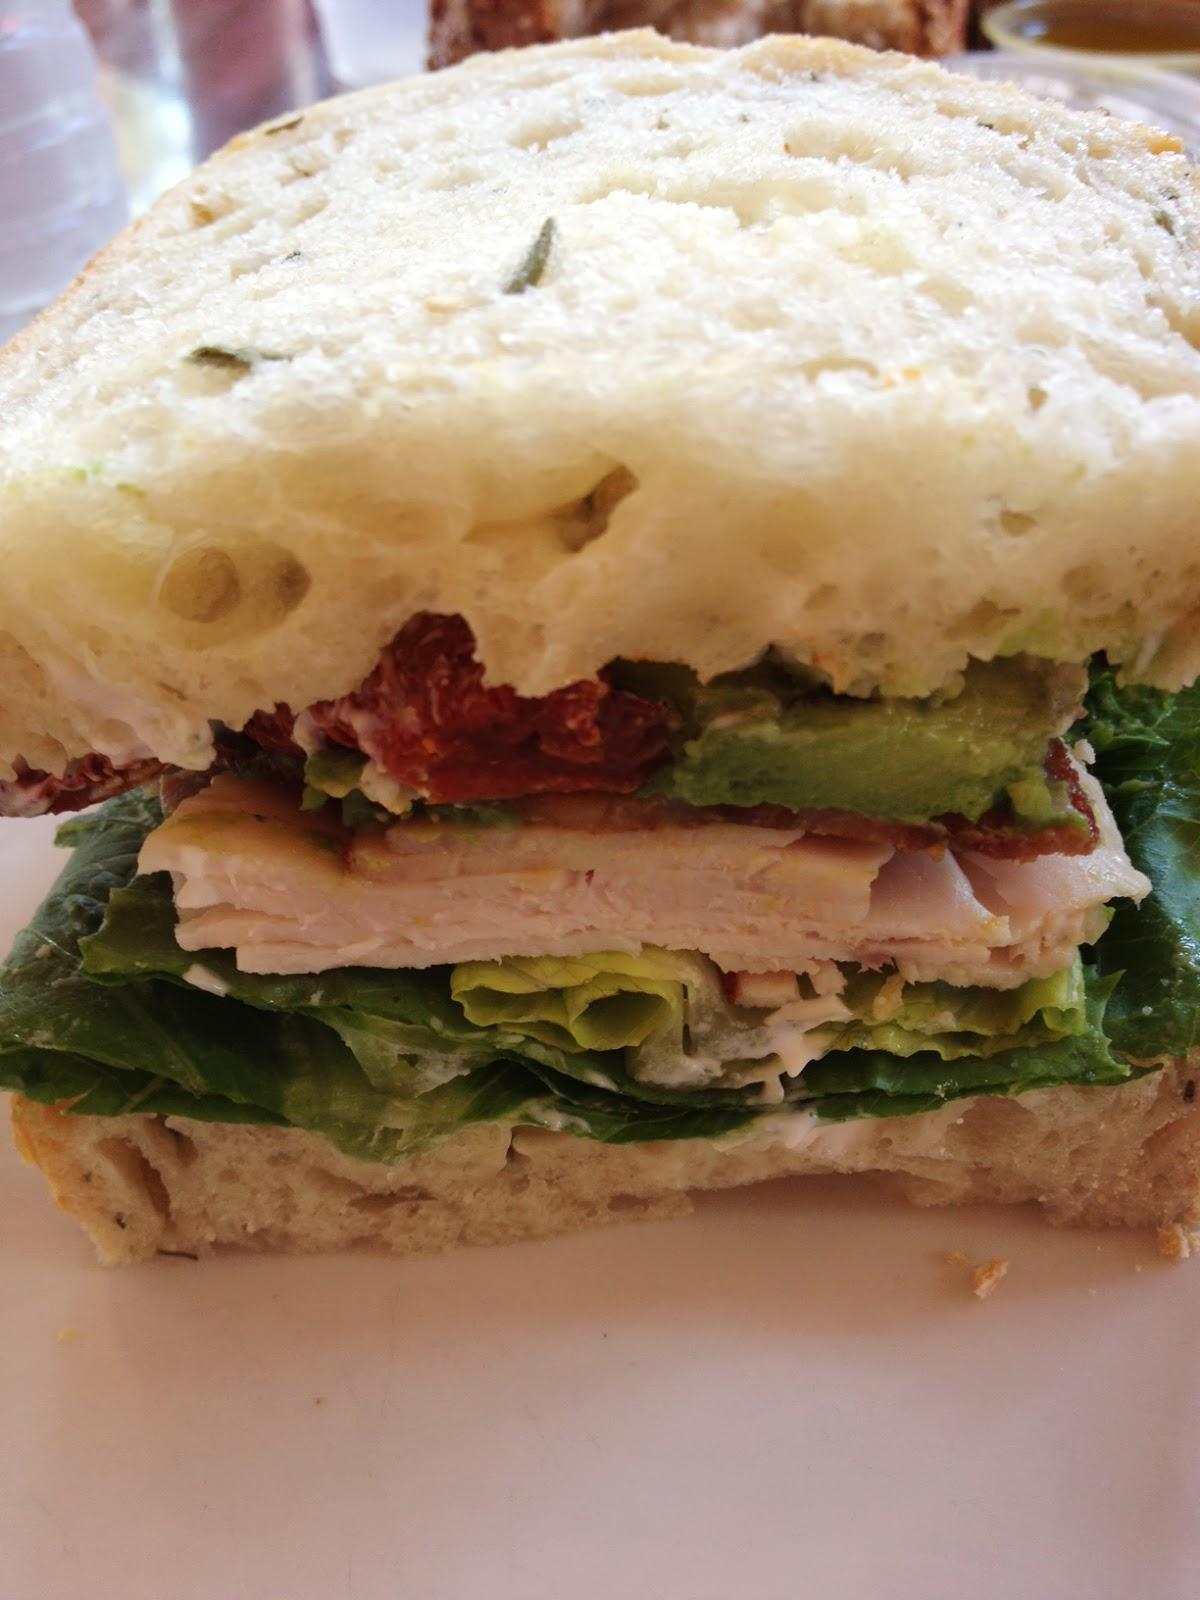 Turkey+cobb+sandwich+on+rosemary+olive+oil+bread.JPG